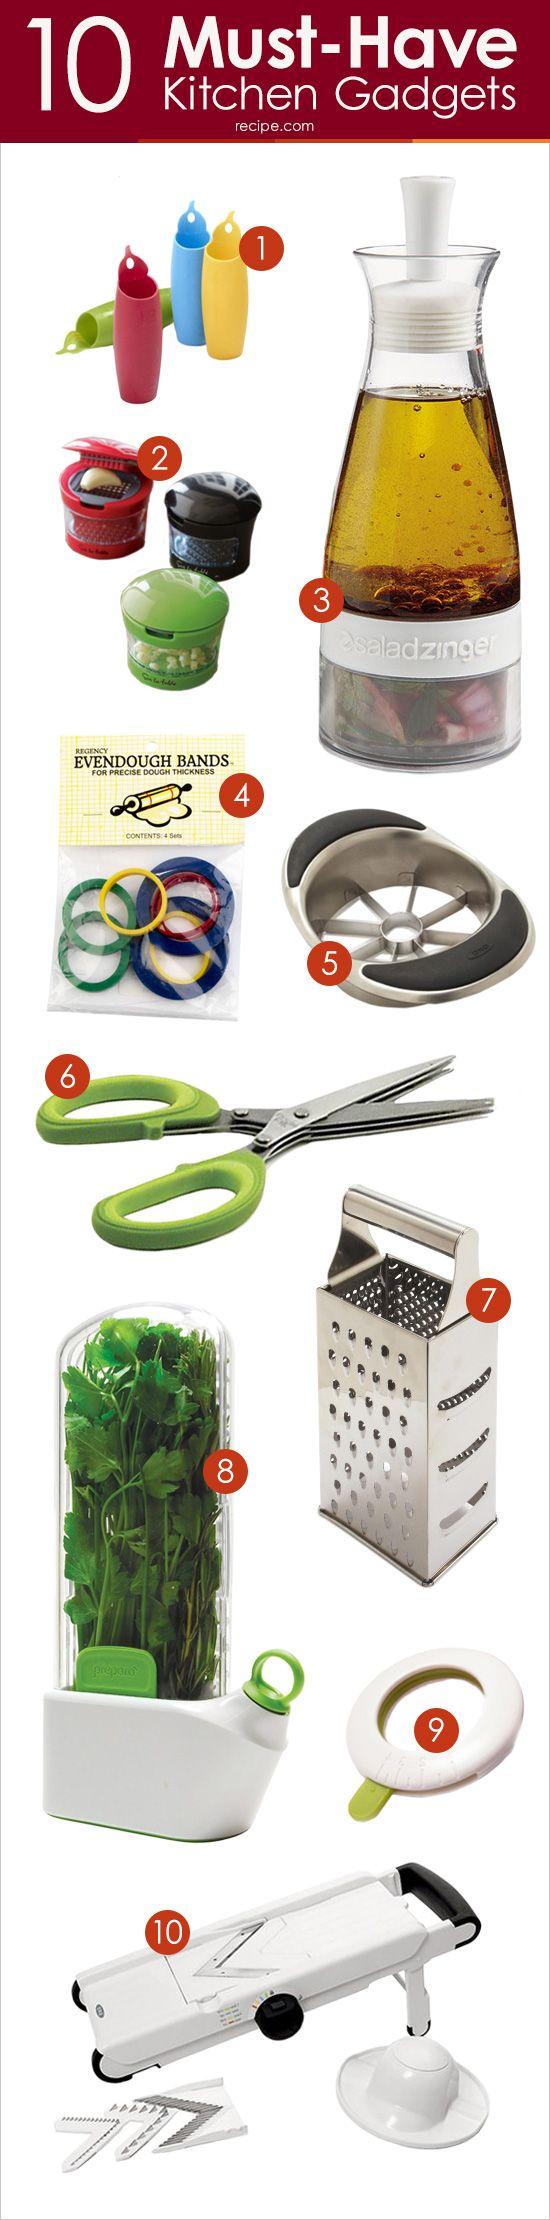 10_must_have_kitchen_gadgets